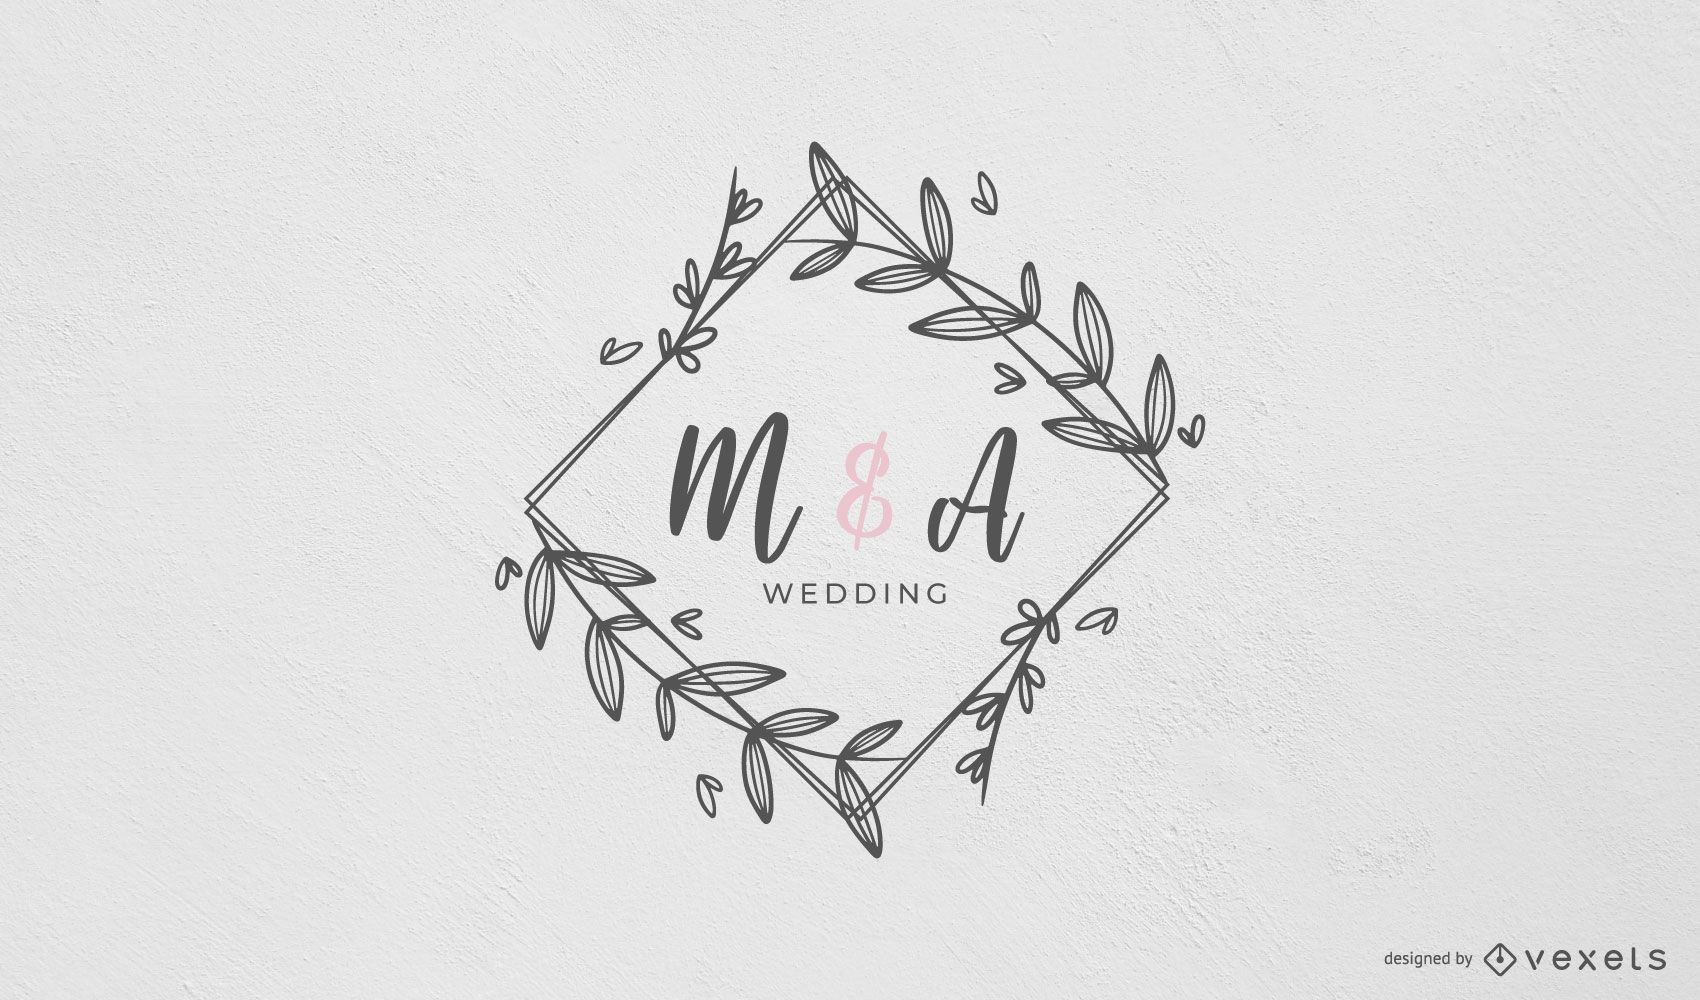 Wedding Monogram With Frame Design Vector Download